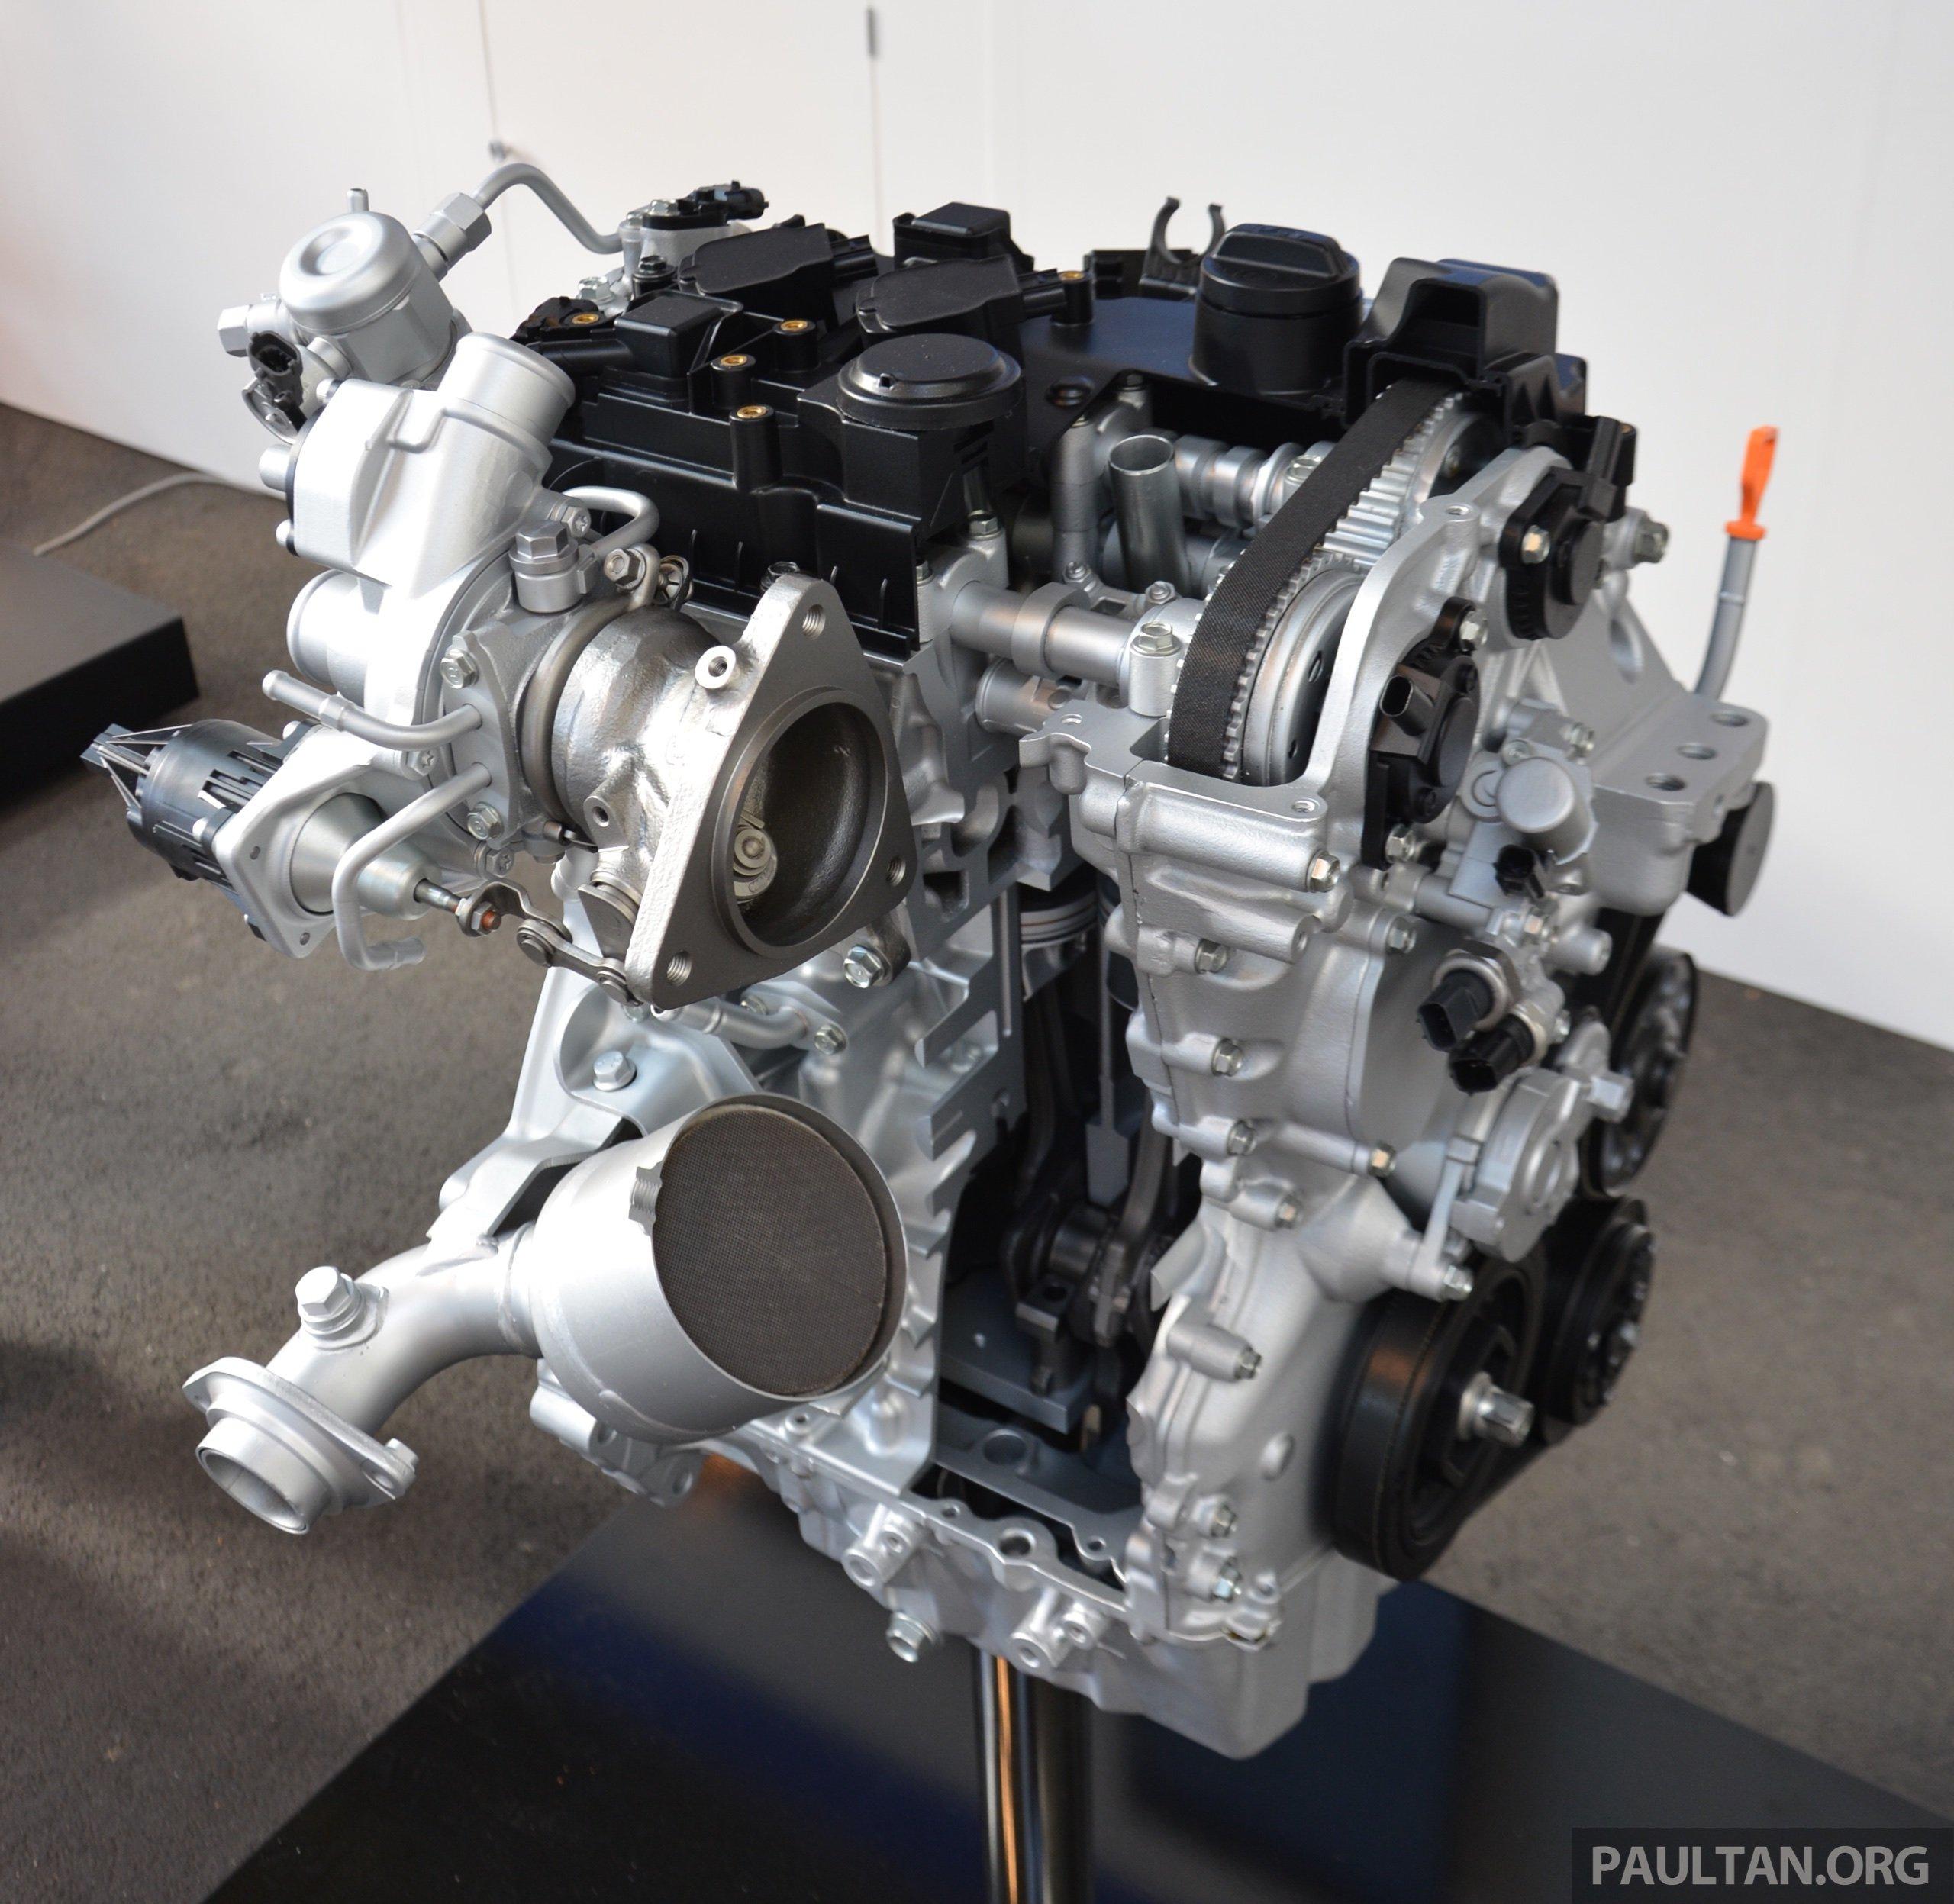 Engine Manual Of Suzuki Raider